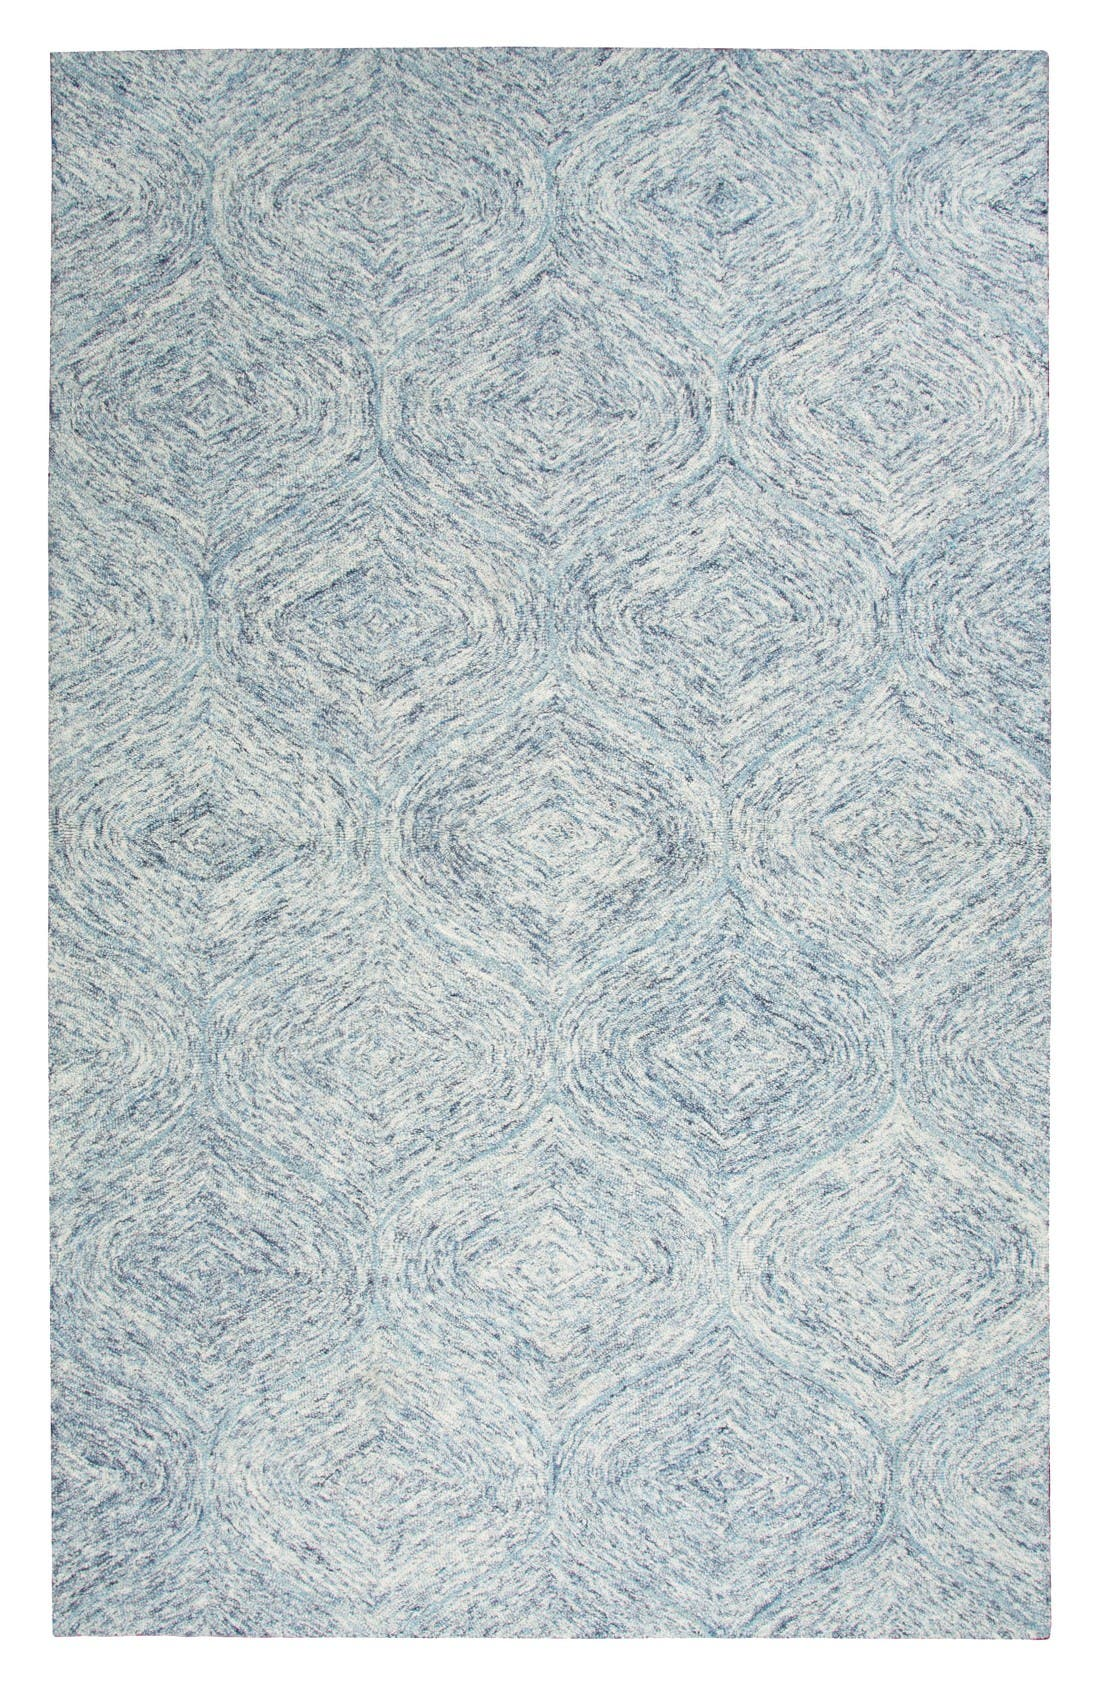 Rizzy Home Irregular Diamond Hand Tufted Wool Area Rug